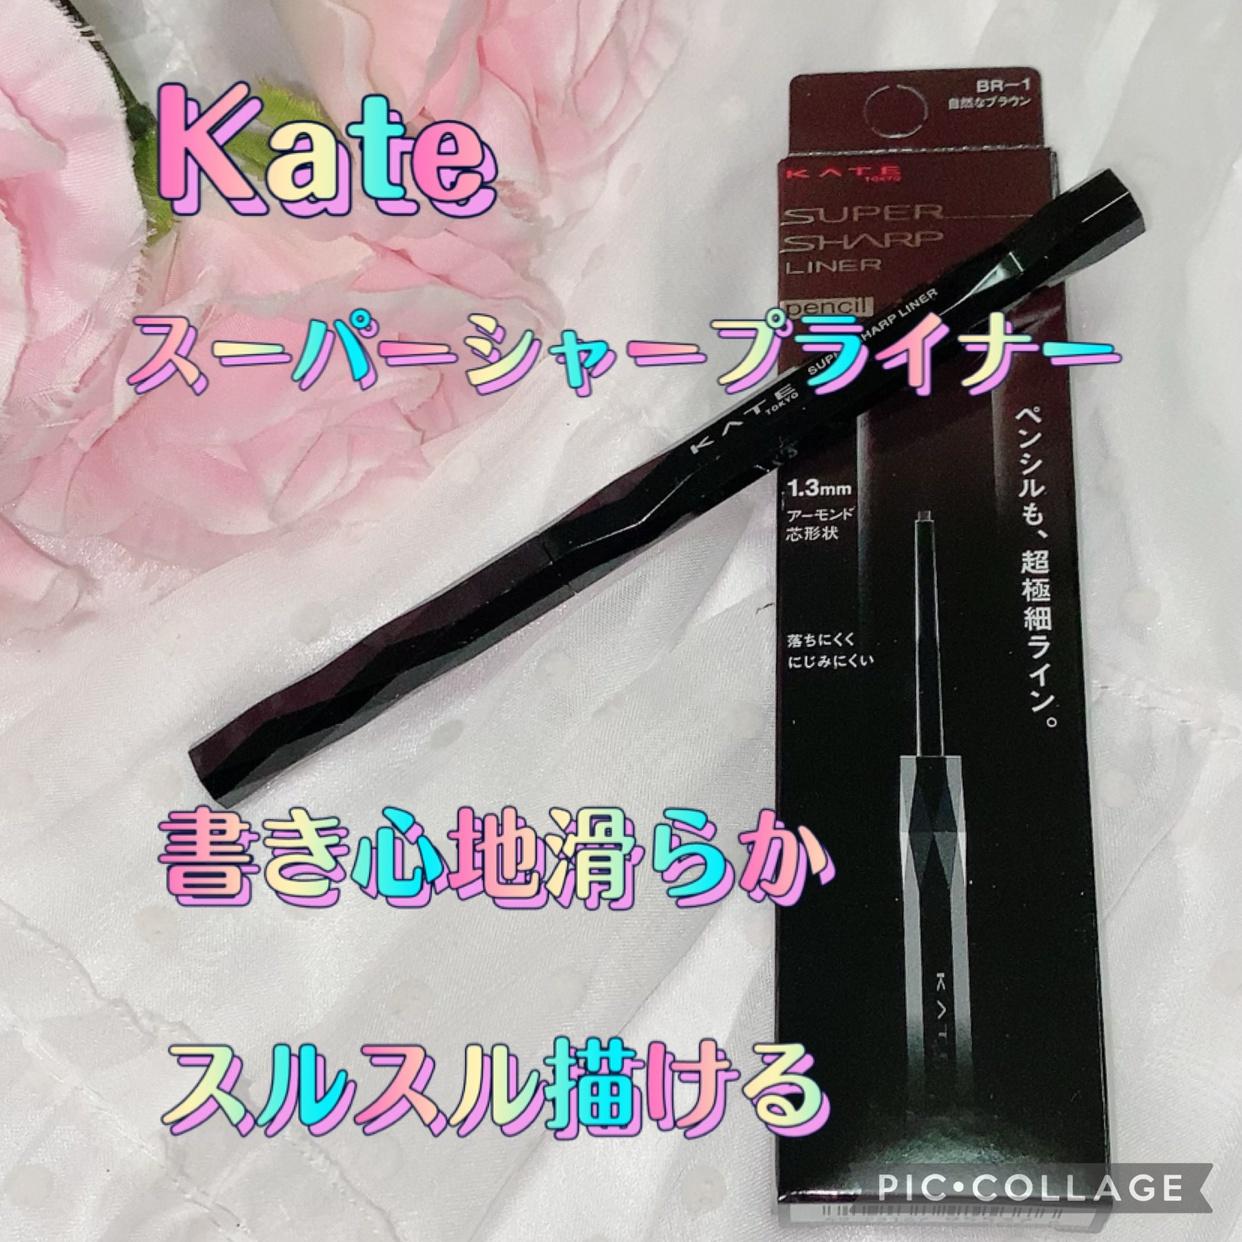 KATE(ケイト) スーパーシャープライナーペンシルの良い点・メリットに関する珈琲豆♡さんの口コミ画像1